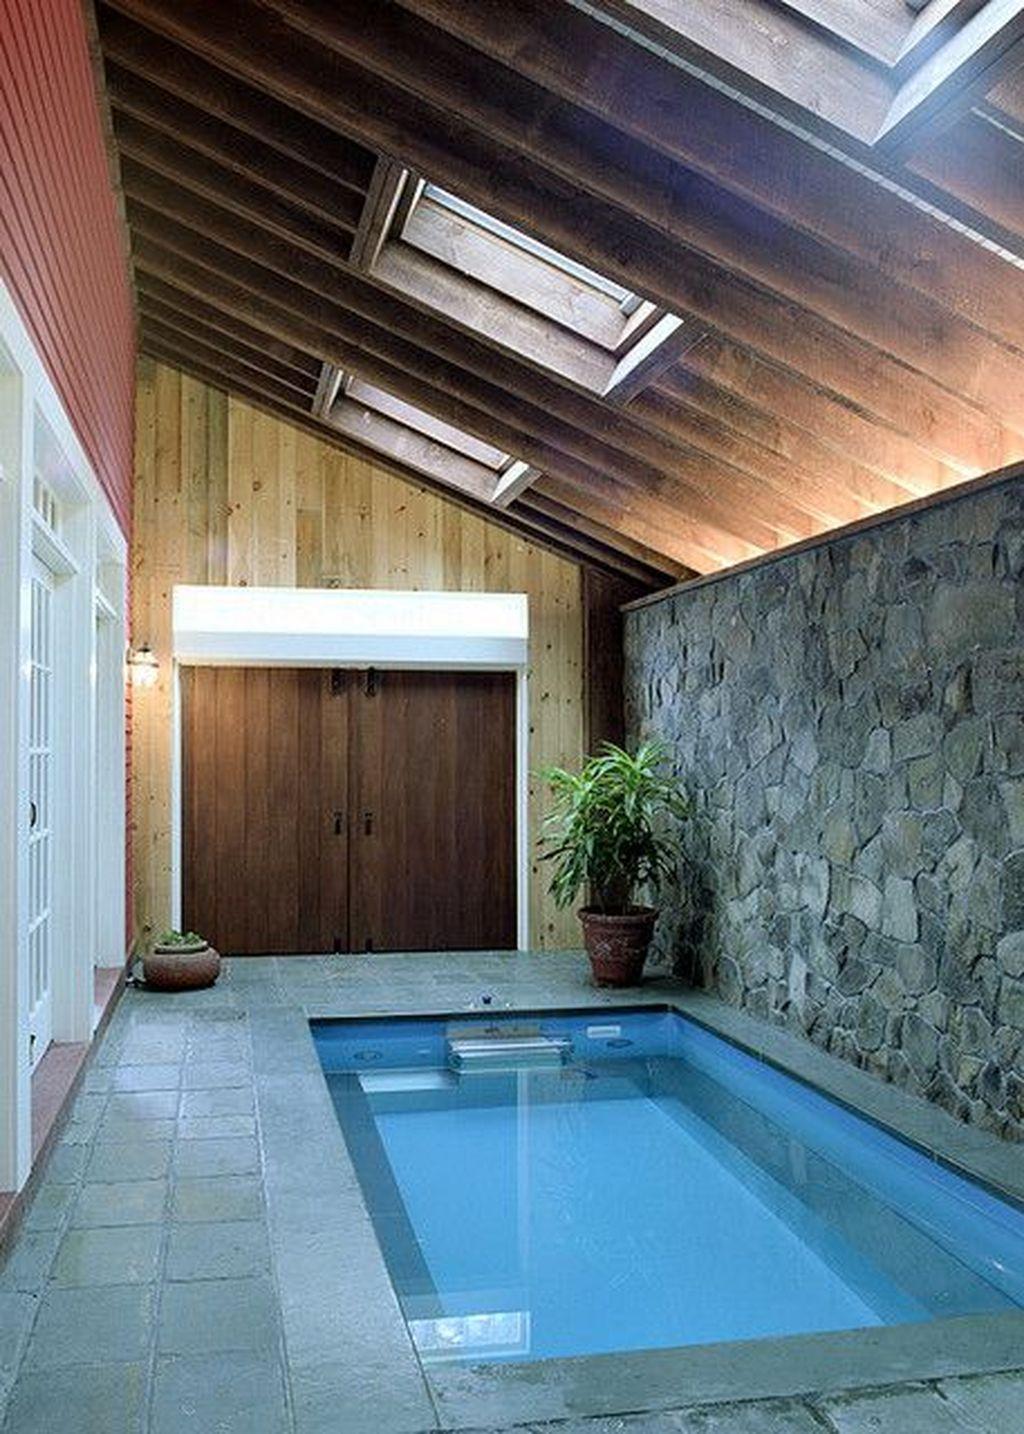 Swimming Pool Design Ideas For Backyard